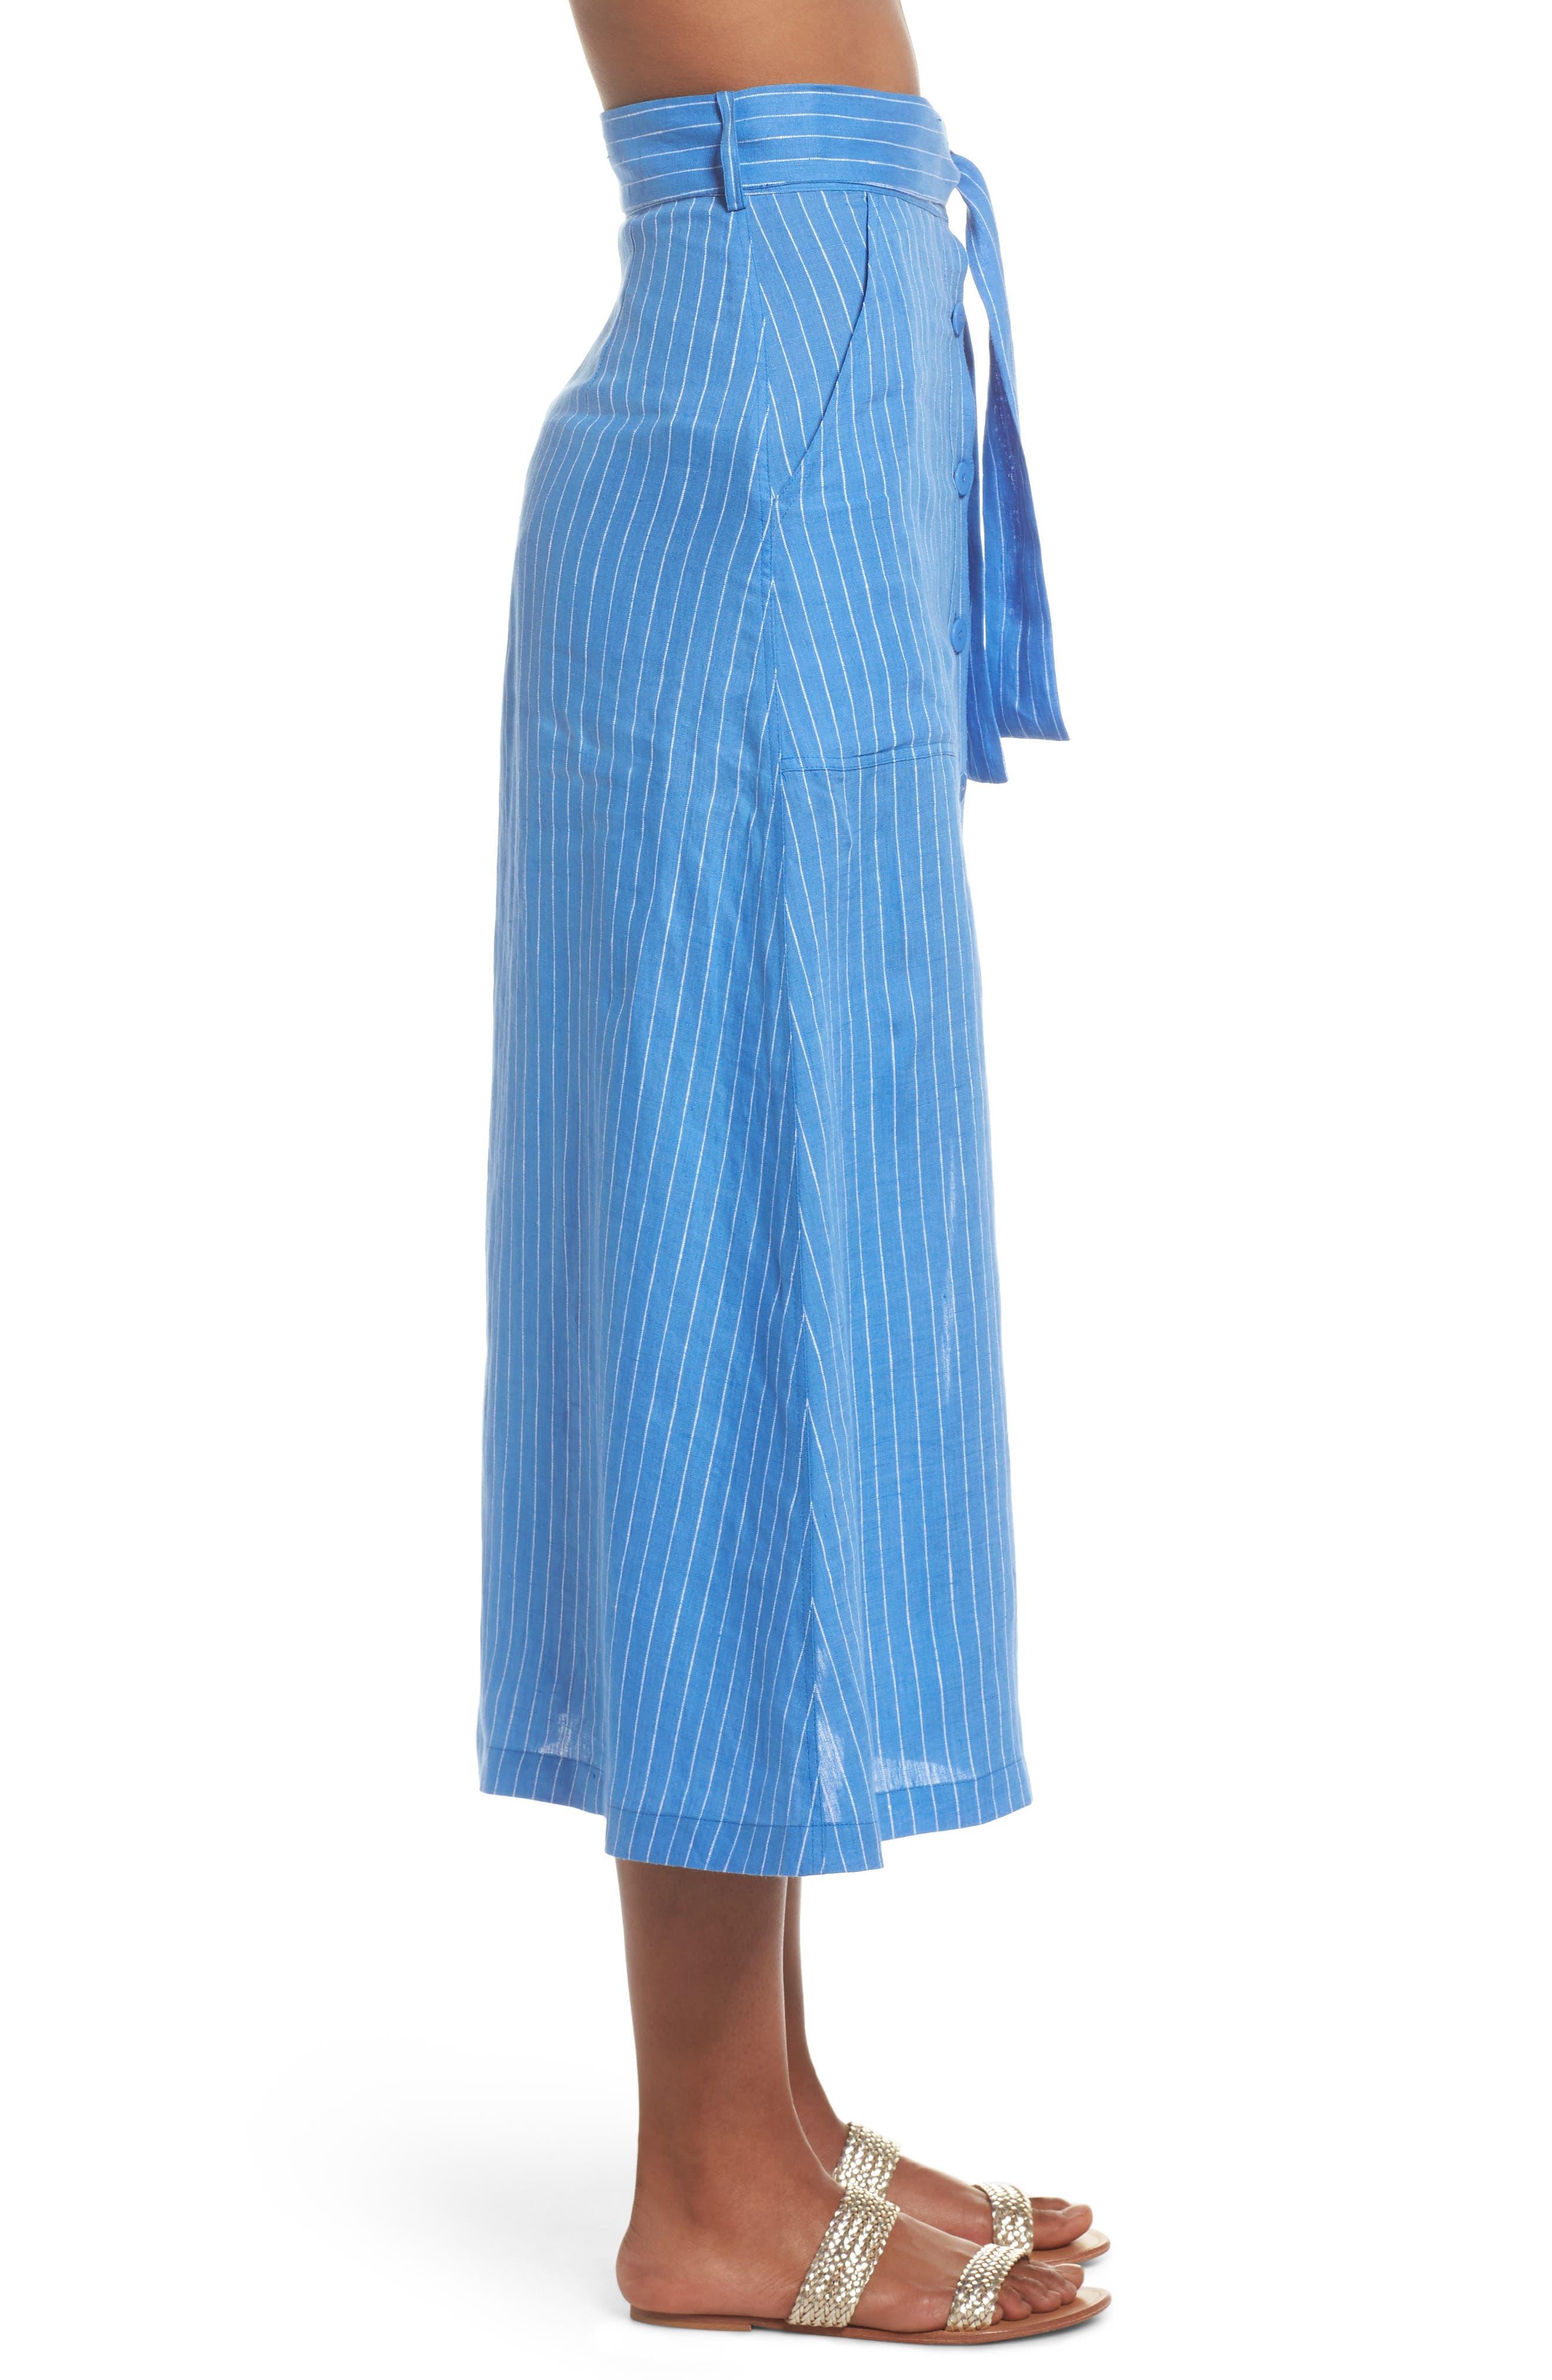 Cover-Up Skirt,                             Alternate thumbnail 3, color,                             Hydrangea/ Ivory